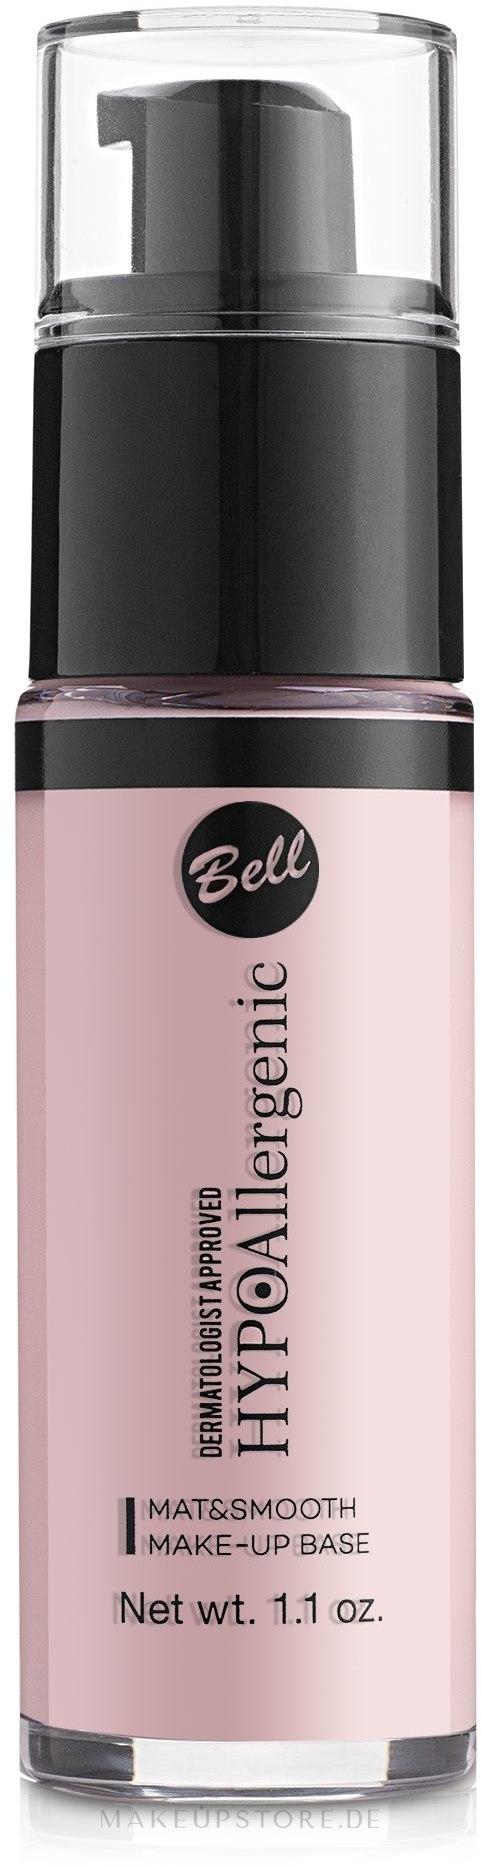 Make-up Base - Bell Hypo Allergenic Mat&Smooth Make-Up Base — Bild 01 - Ivory